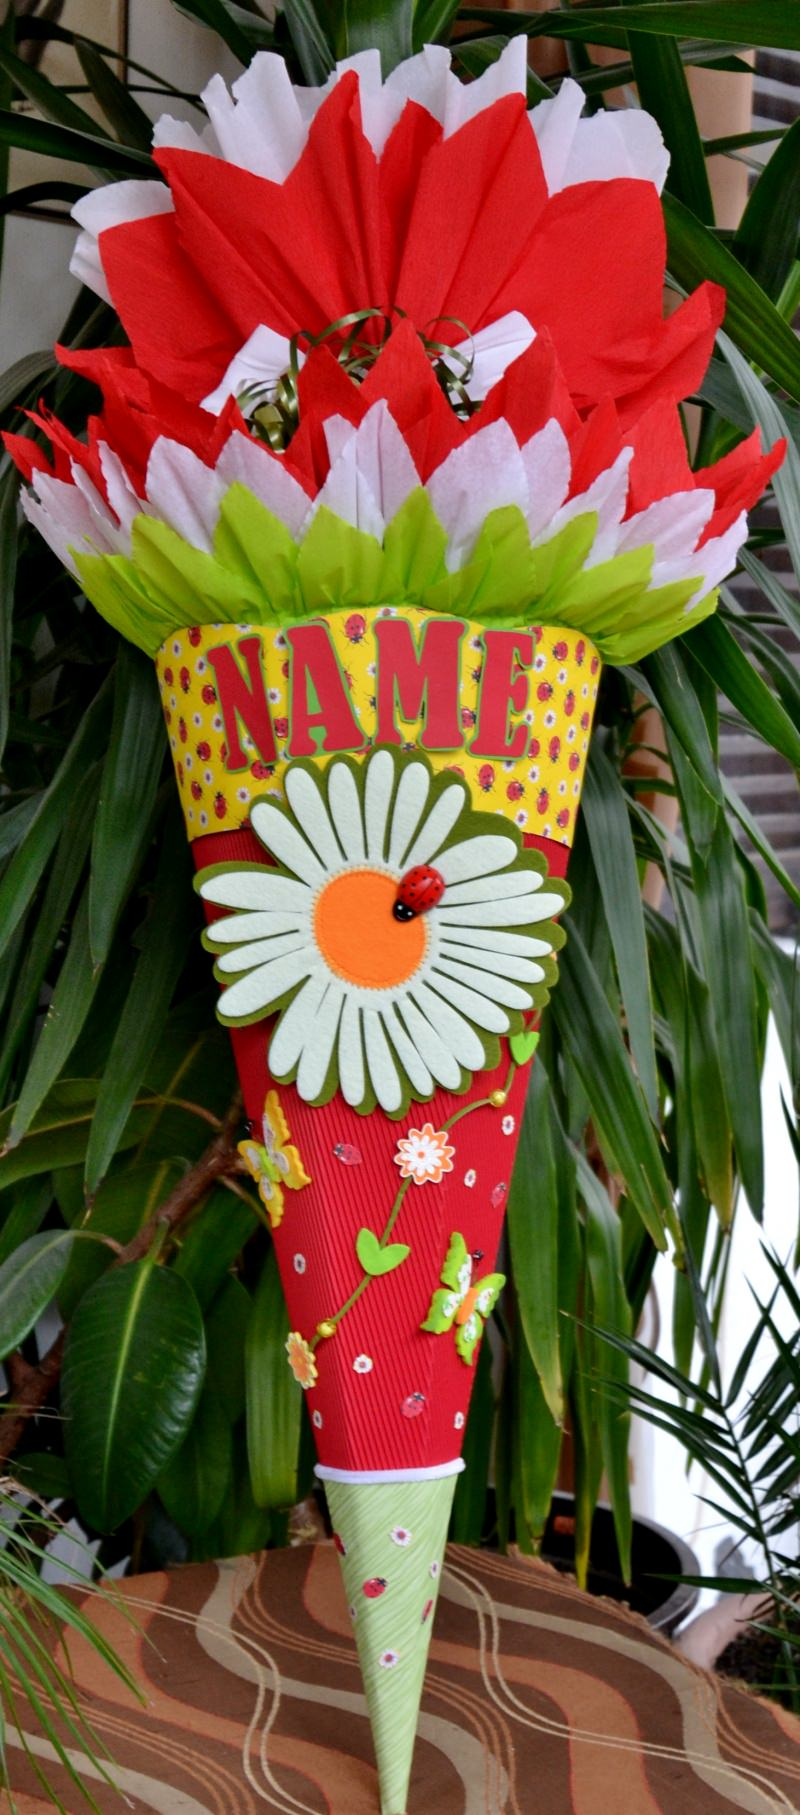 - Schultüte Zuckertüte Marienkäfer neu Einschulung Blume Schmetterling Rohling 68 - Schultüte Zuckertüte Marienkäfer neu Einschulung Blume Schmetterling Rohling 68